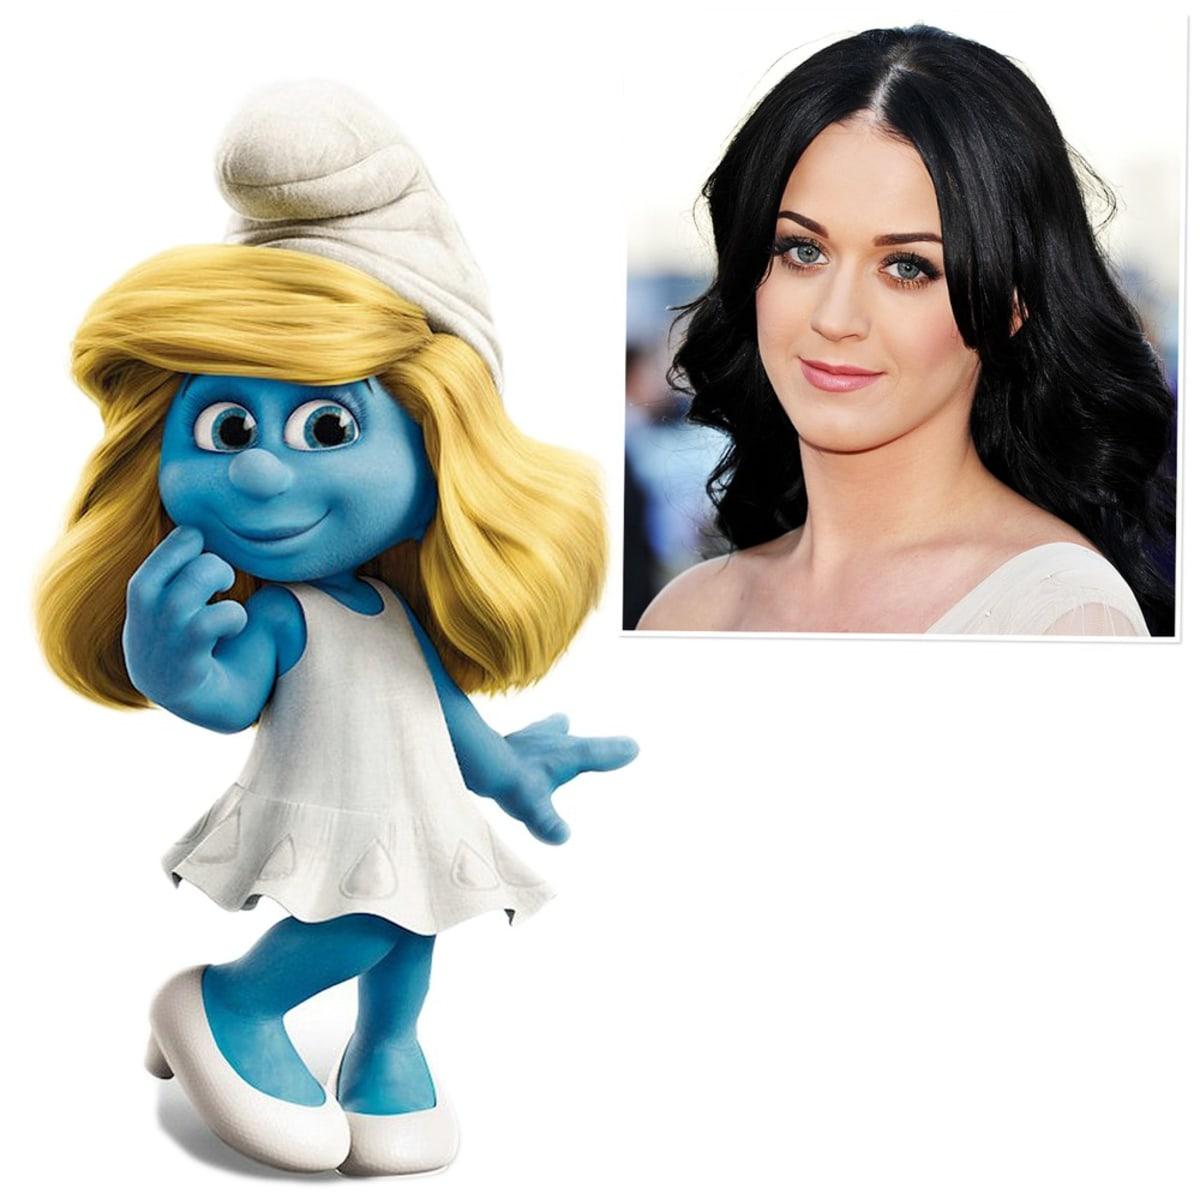 Image: Katy Perry